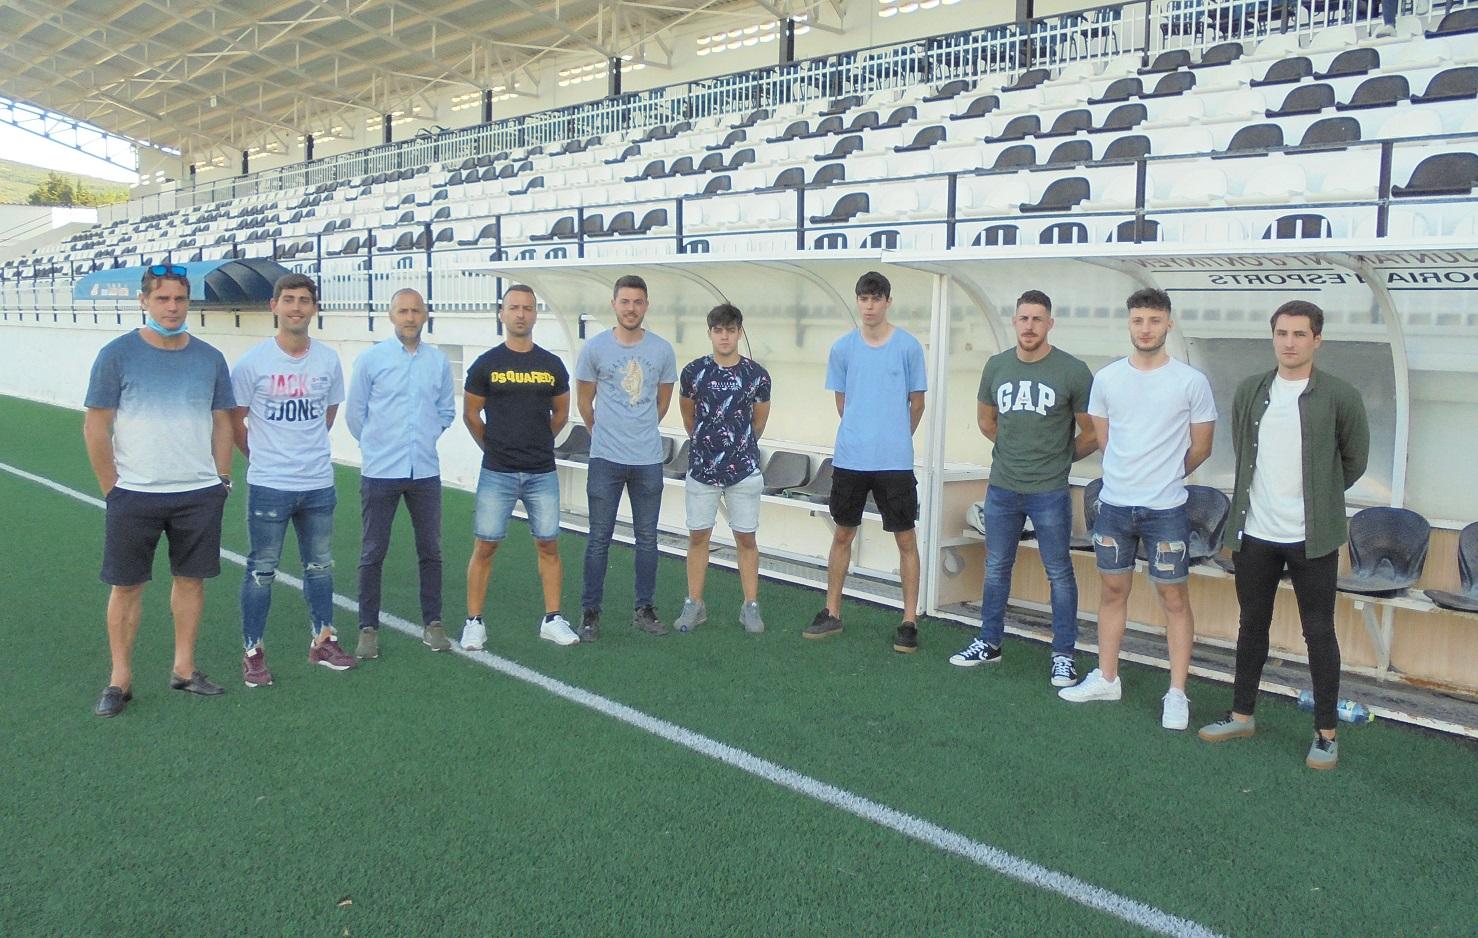 Nou cares noves al nou projecte del Deportivo Ontinyent